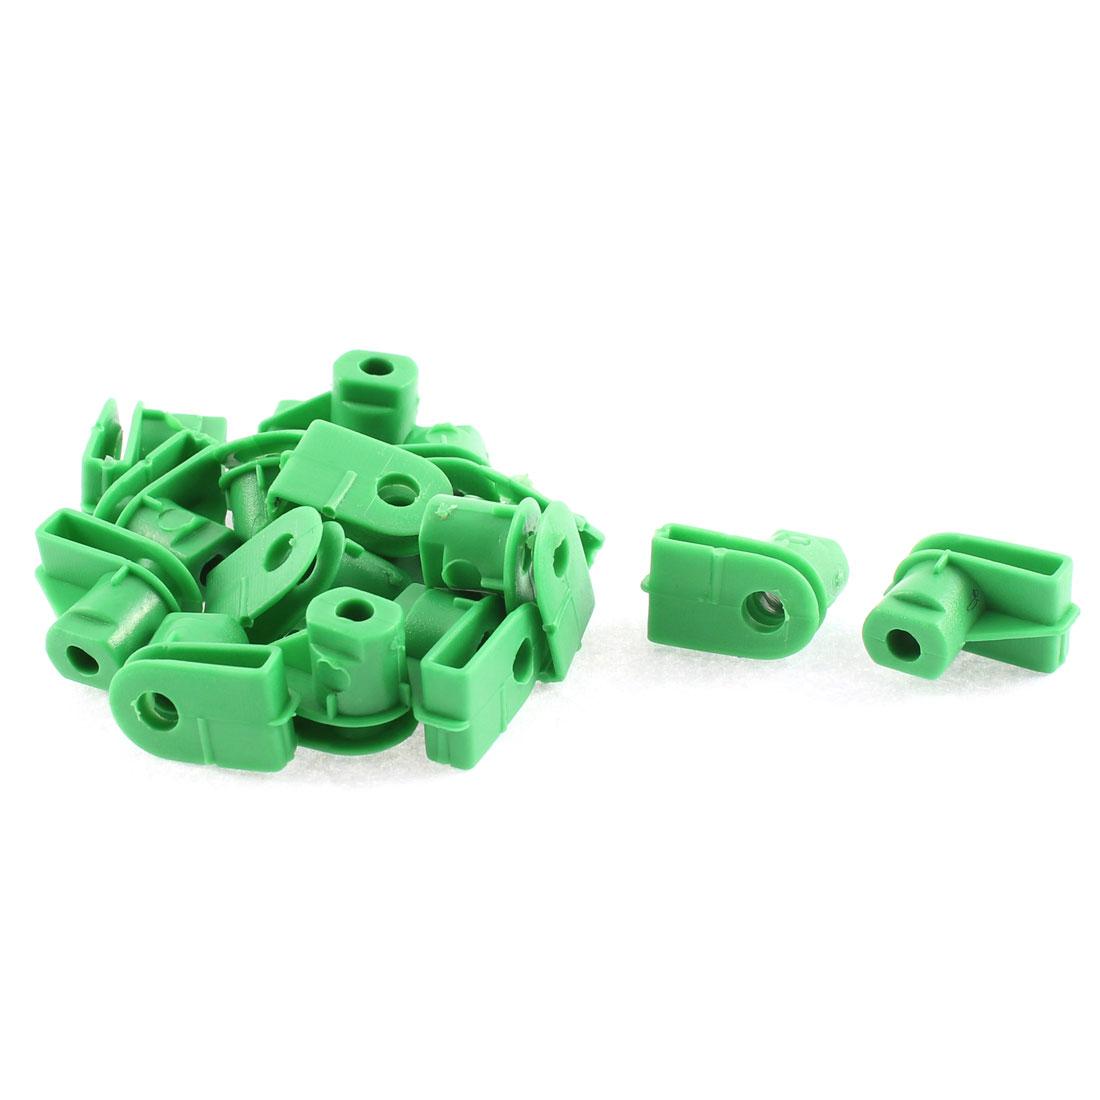 15 Pcs Green Plastic Door Interior Bumper Fastener Clip for Audi